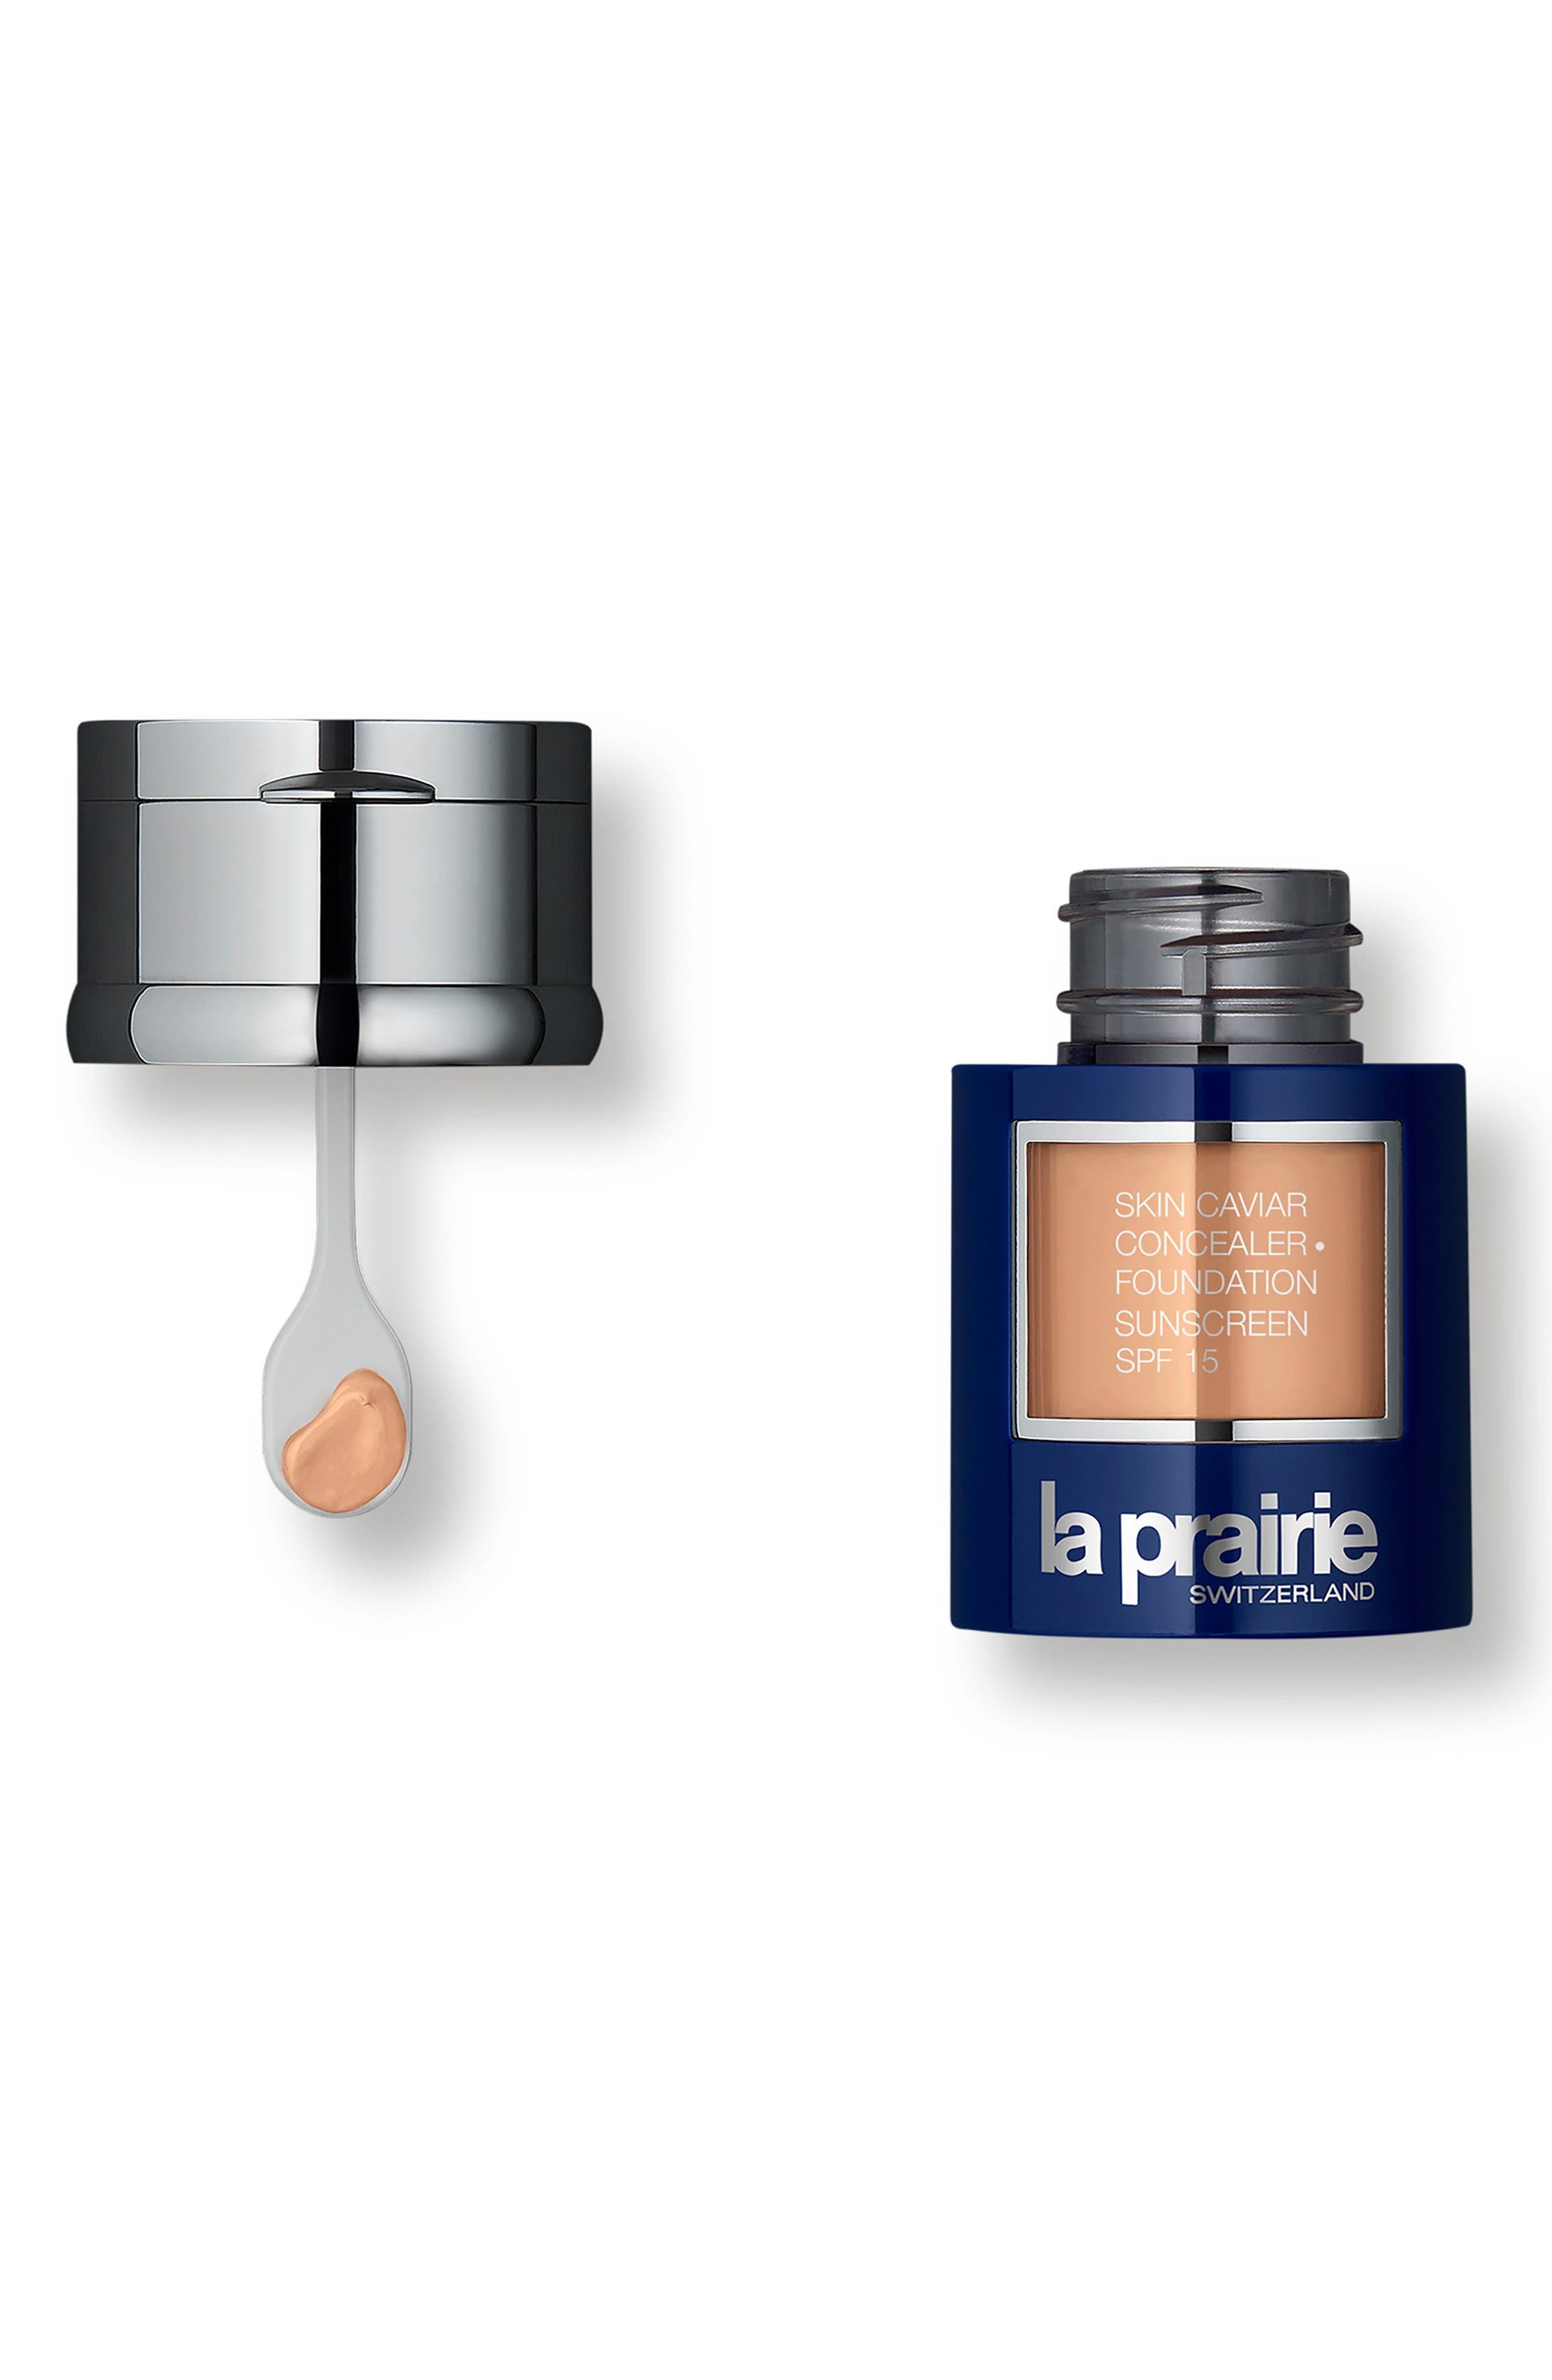 Skin Caviar Concealer + Foundation Sunscreen SPF 15,                             Alternate thumbnail 3, color,                             WARM BEIGE